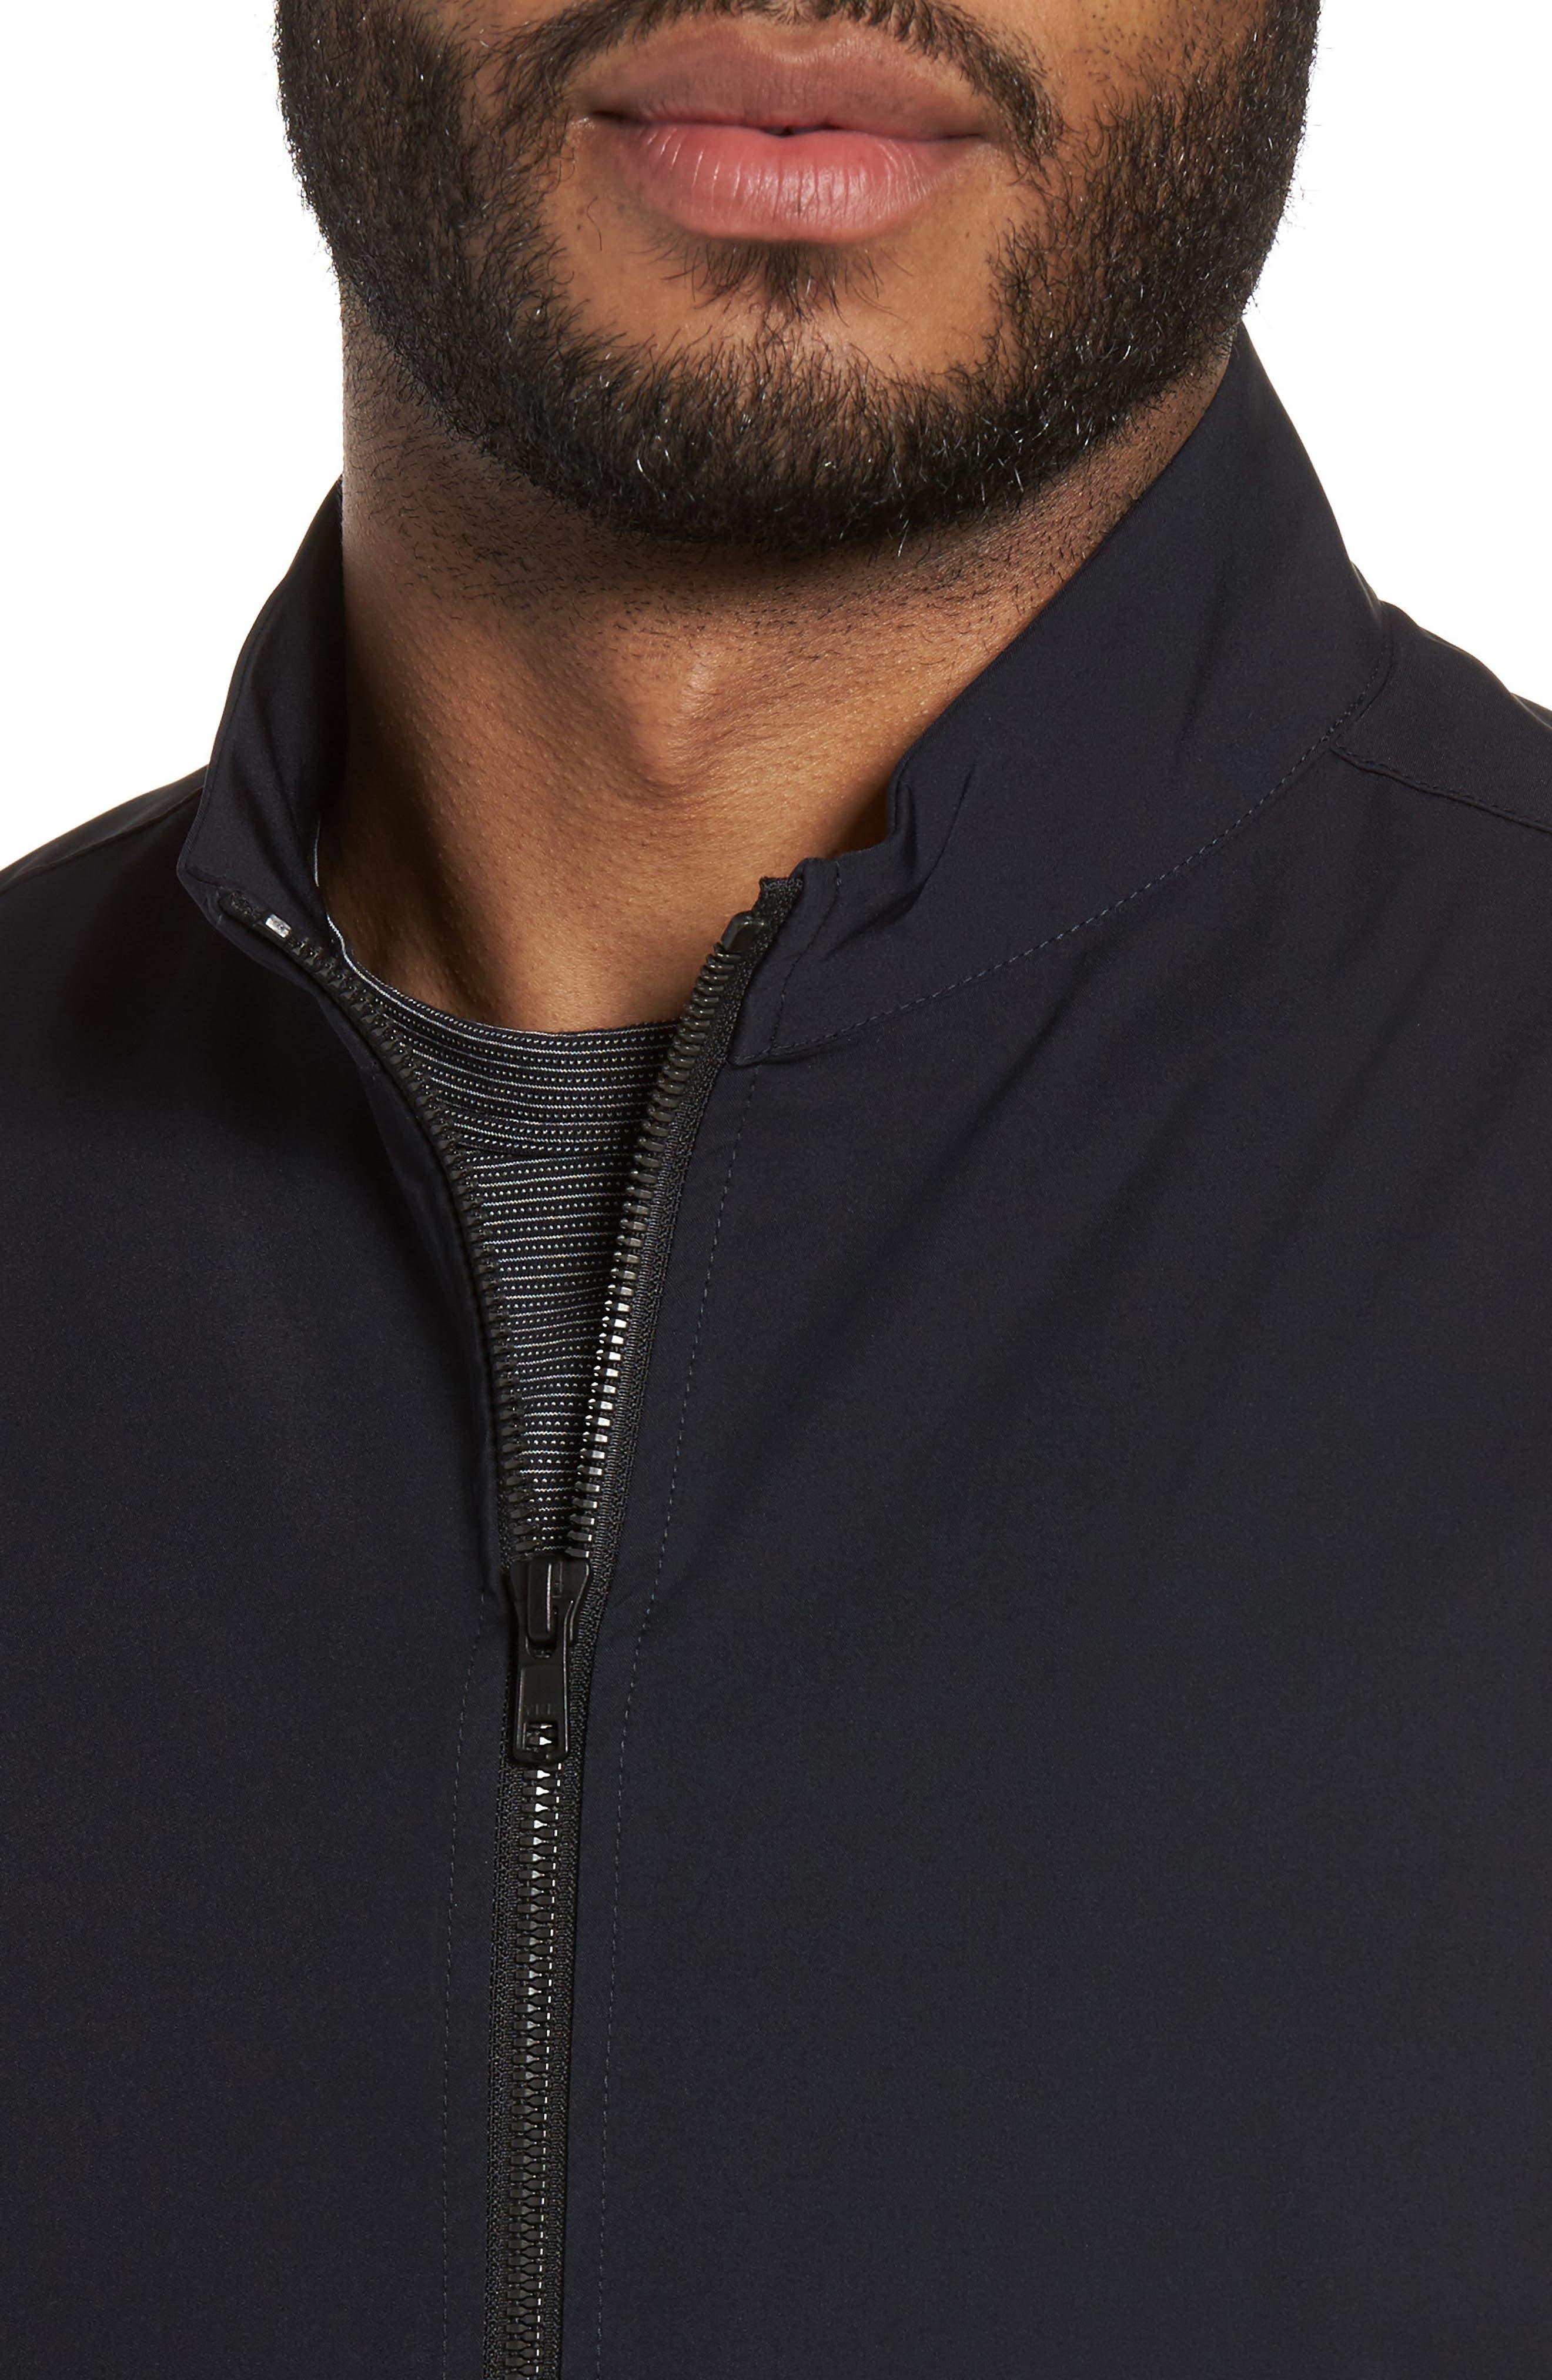 Scotty Bevan Zip Front Jacket,                             Alternate thumbnail 4, color,                             Eclipse